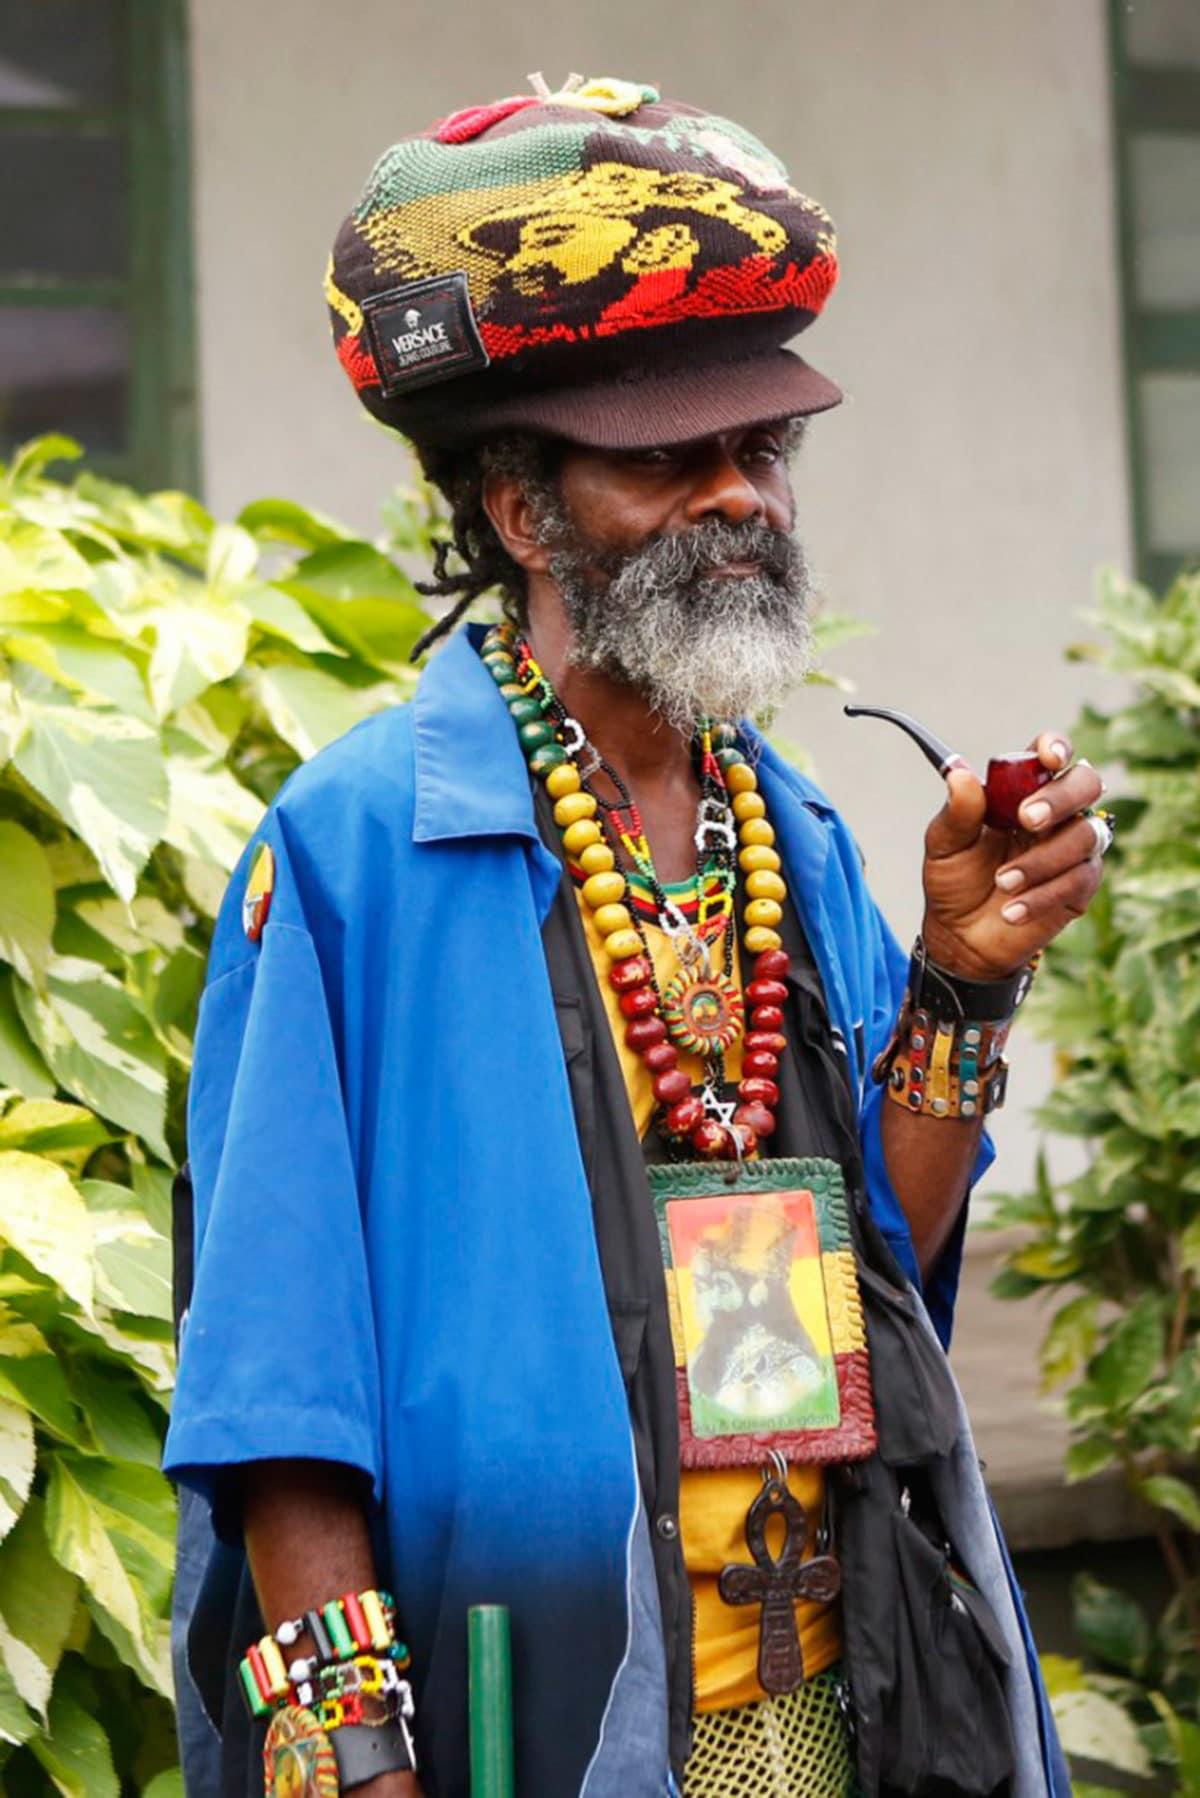 Rohan-Marley-guld-ø-Jamiaca - Jamaica-feeling.jpg